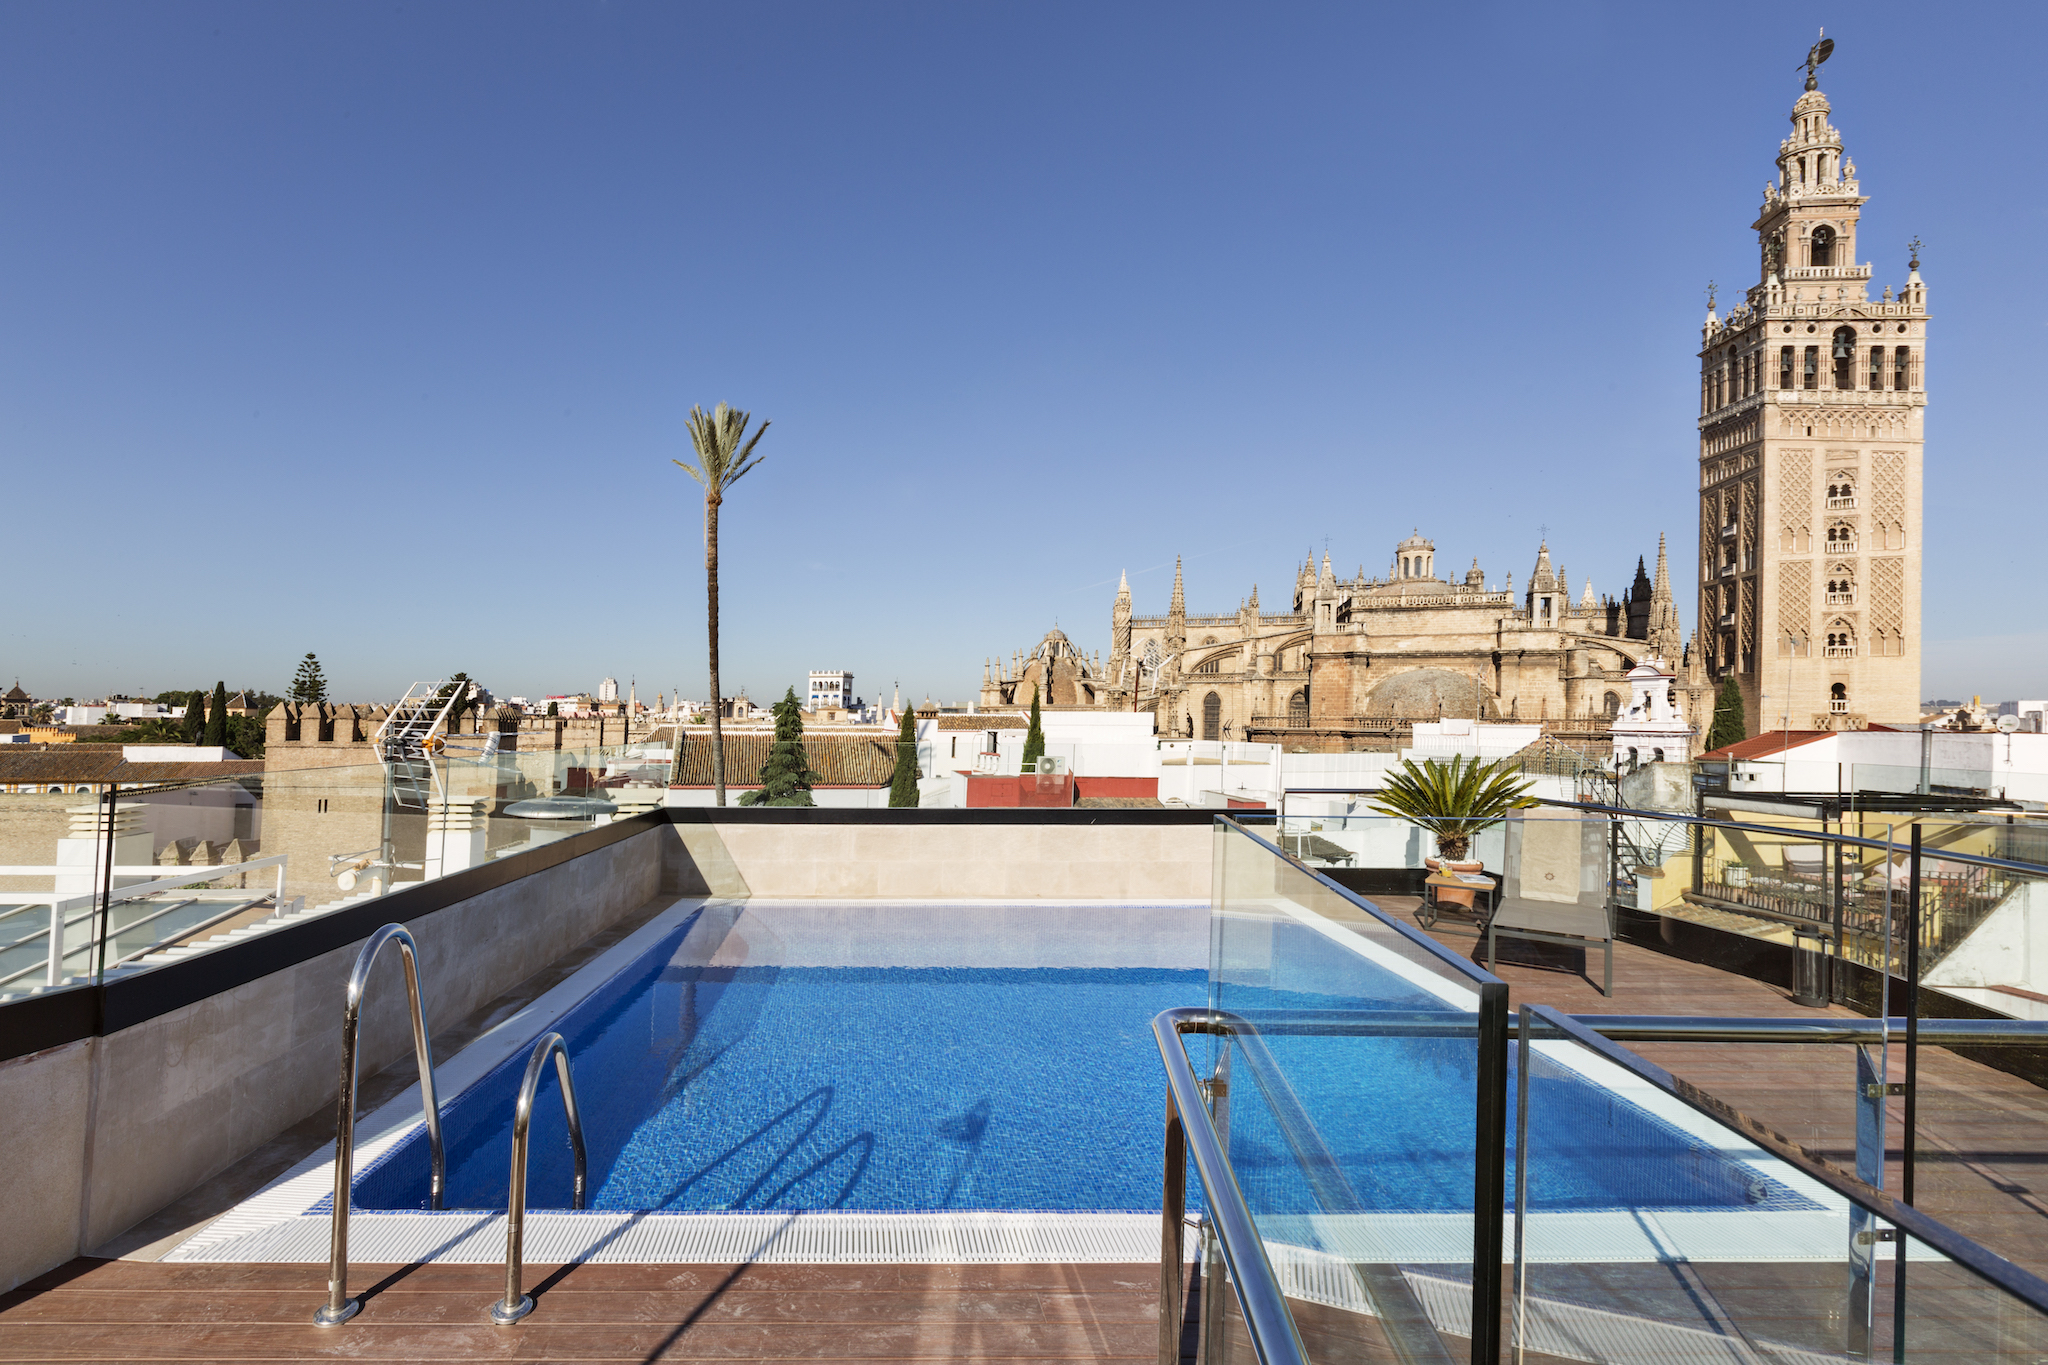 Rooftop Swimming Pool Seville - Hotel Casa 1800 Sevilla pour Hotel Seville Piscine